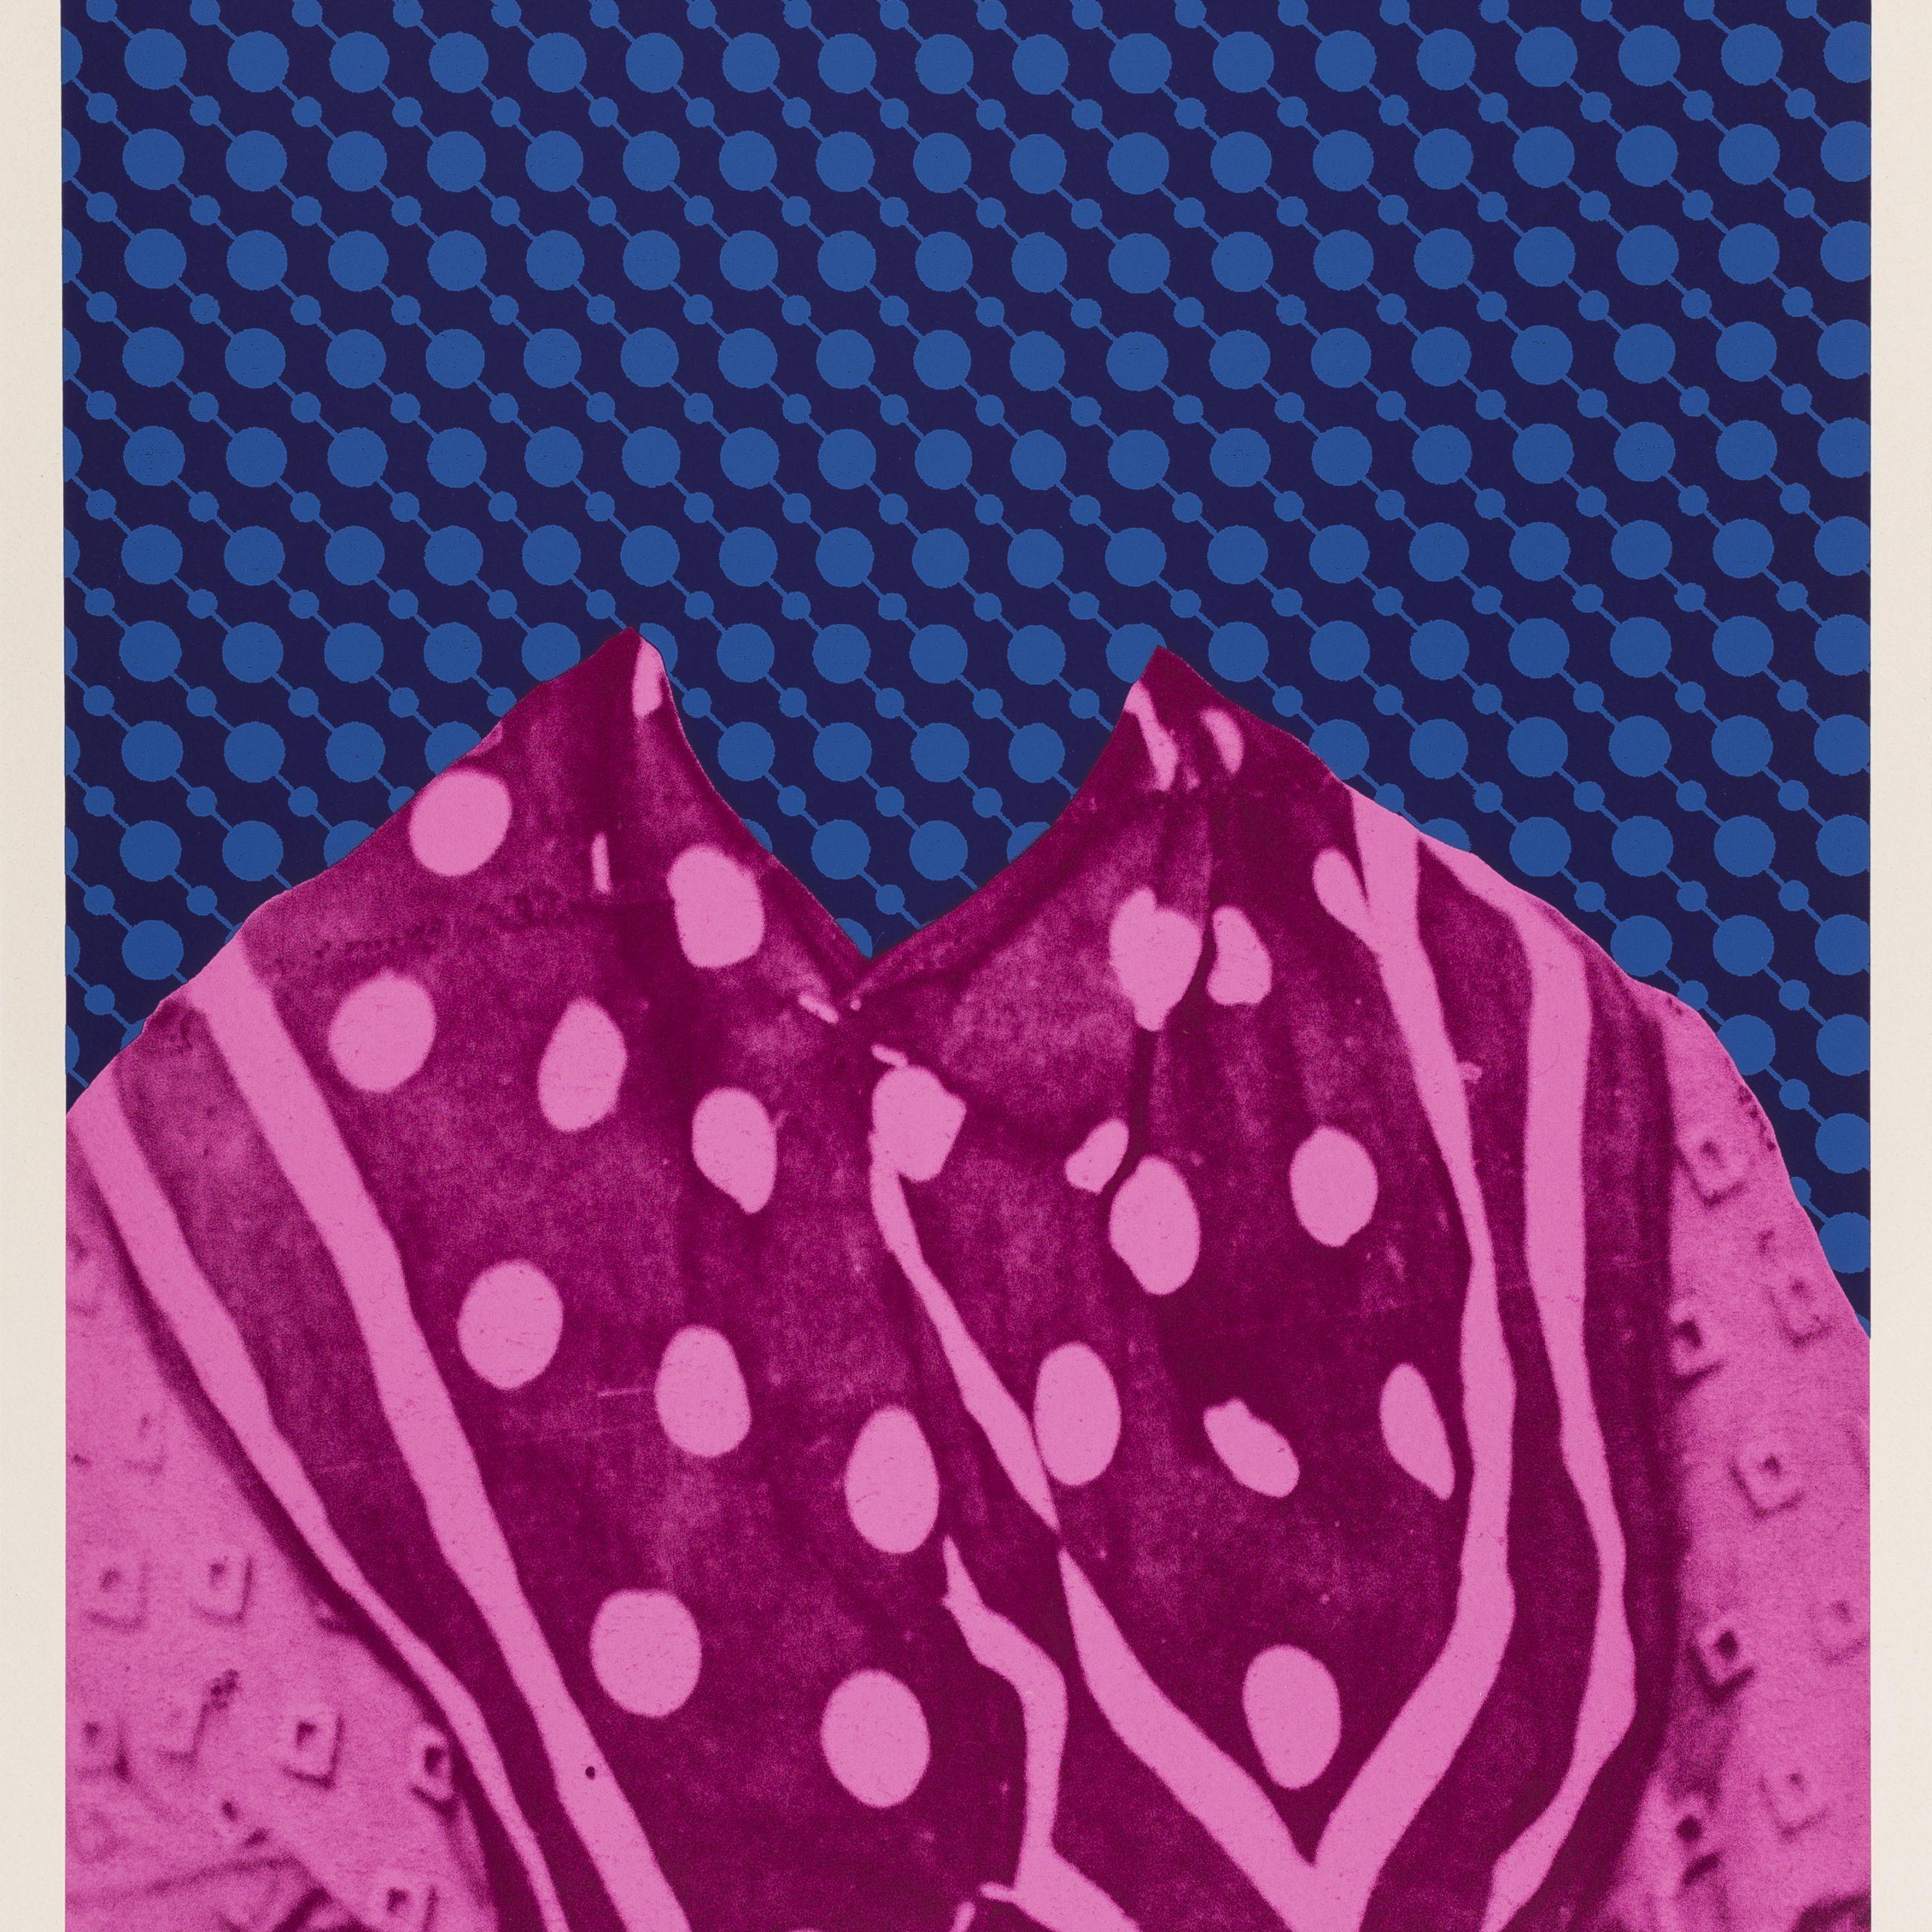 Matt Smith, S.Africa: Venus Monstrosa, 2019. Courtesy of Cynthia Corbett Gallery